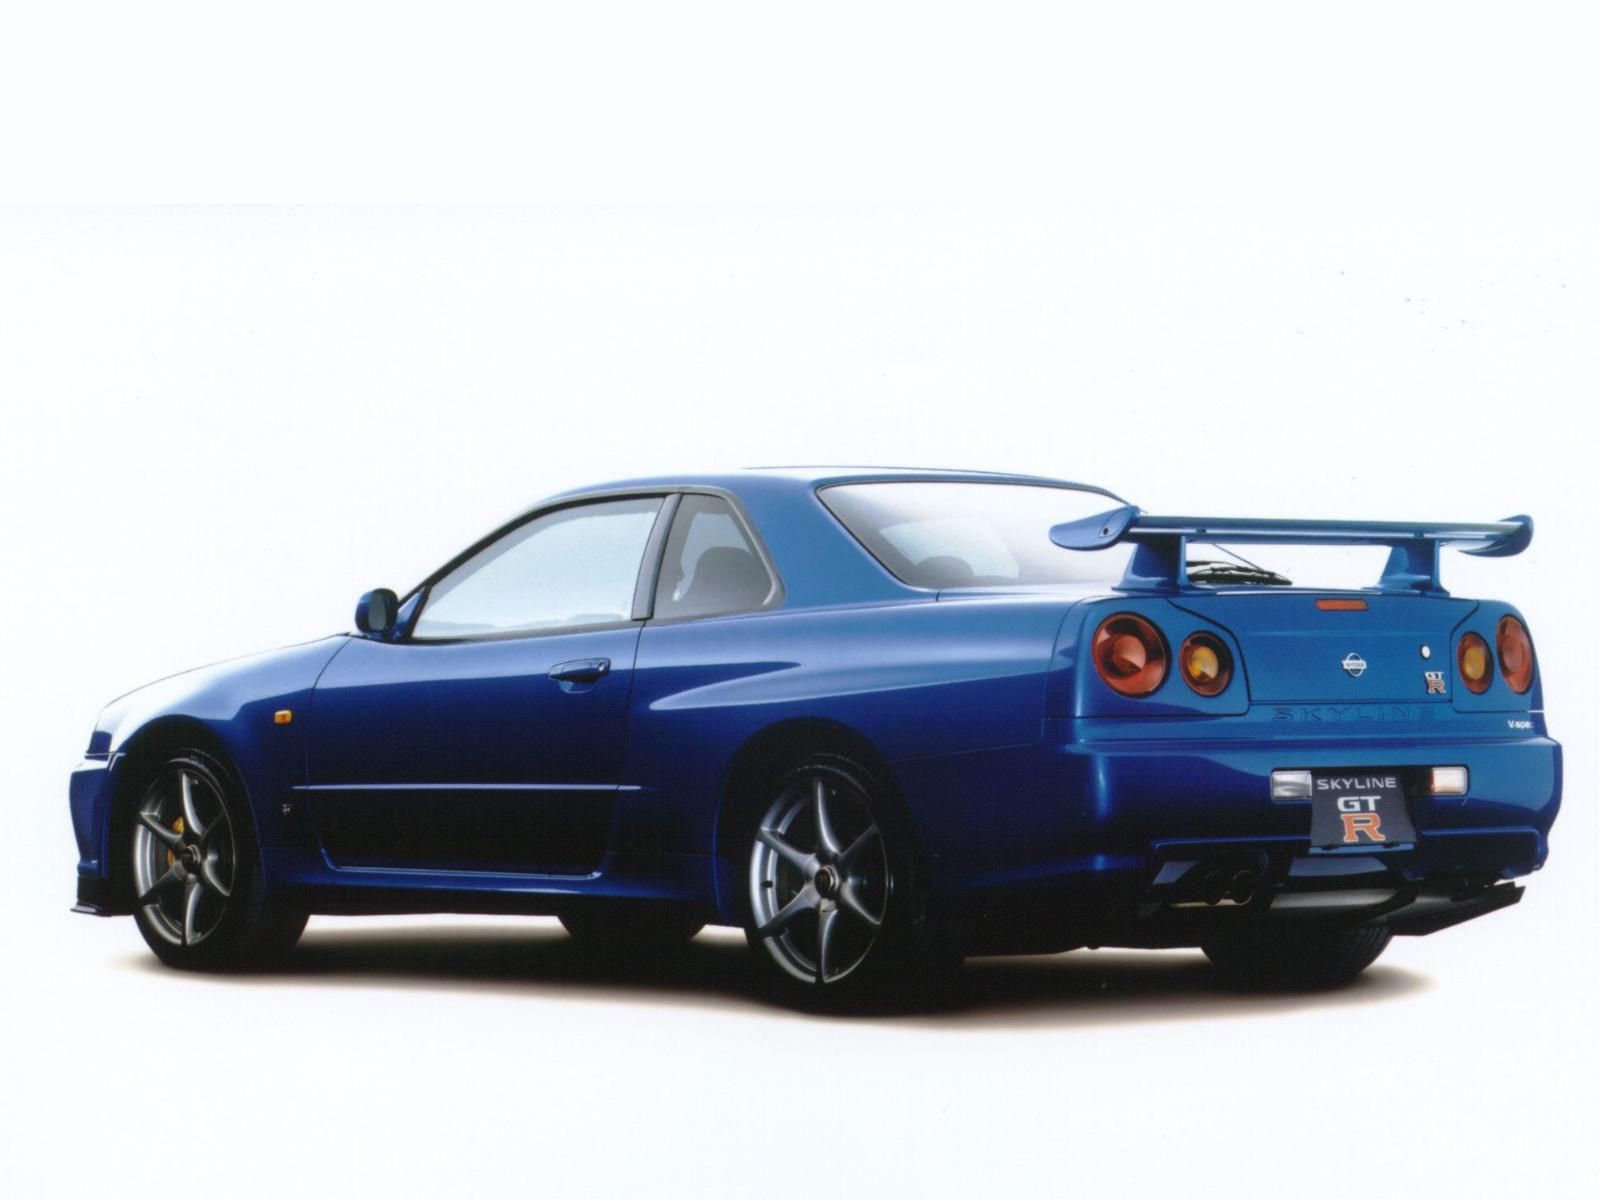 Nissan Skyline X (R34) 1998 - 2002 Sedan #2